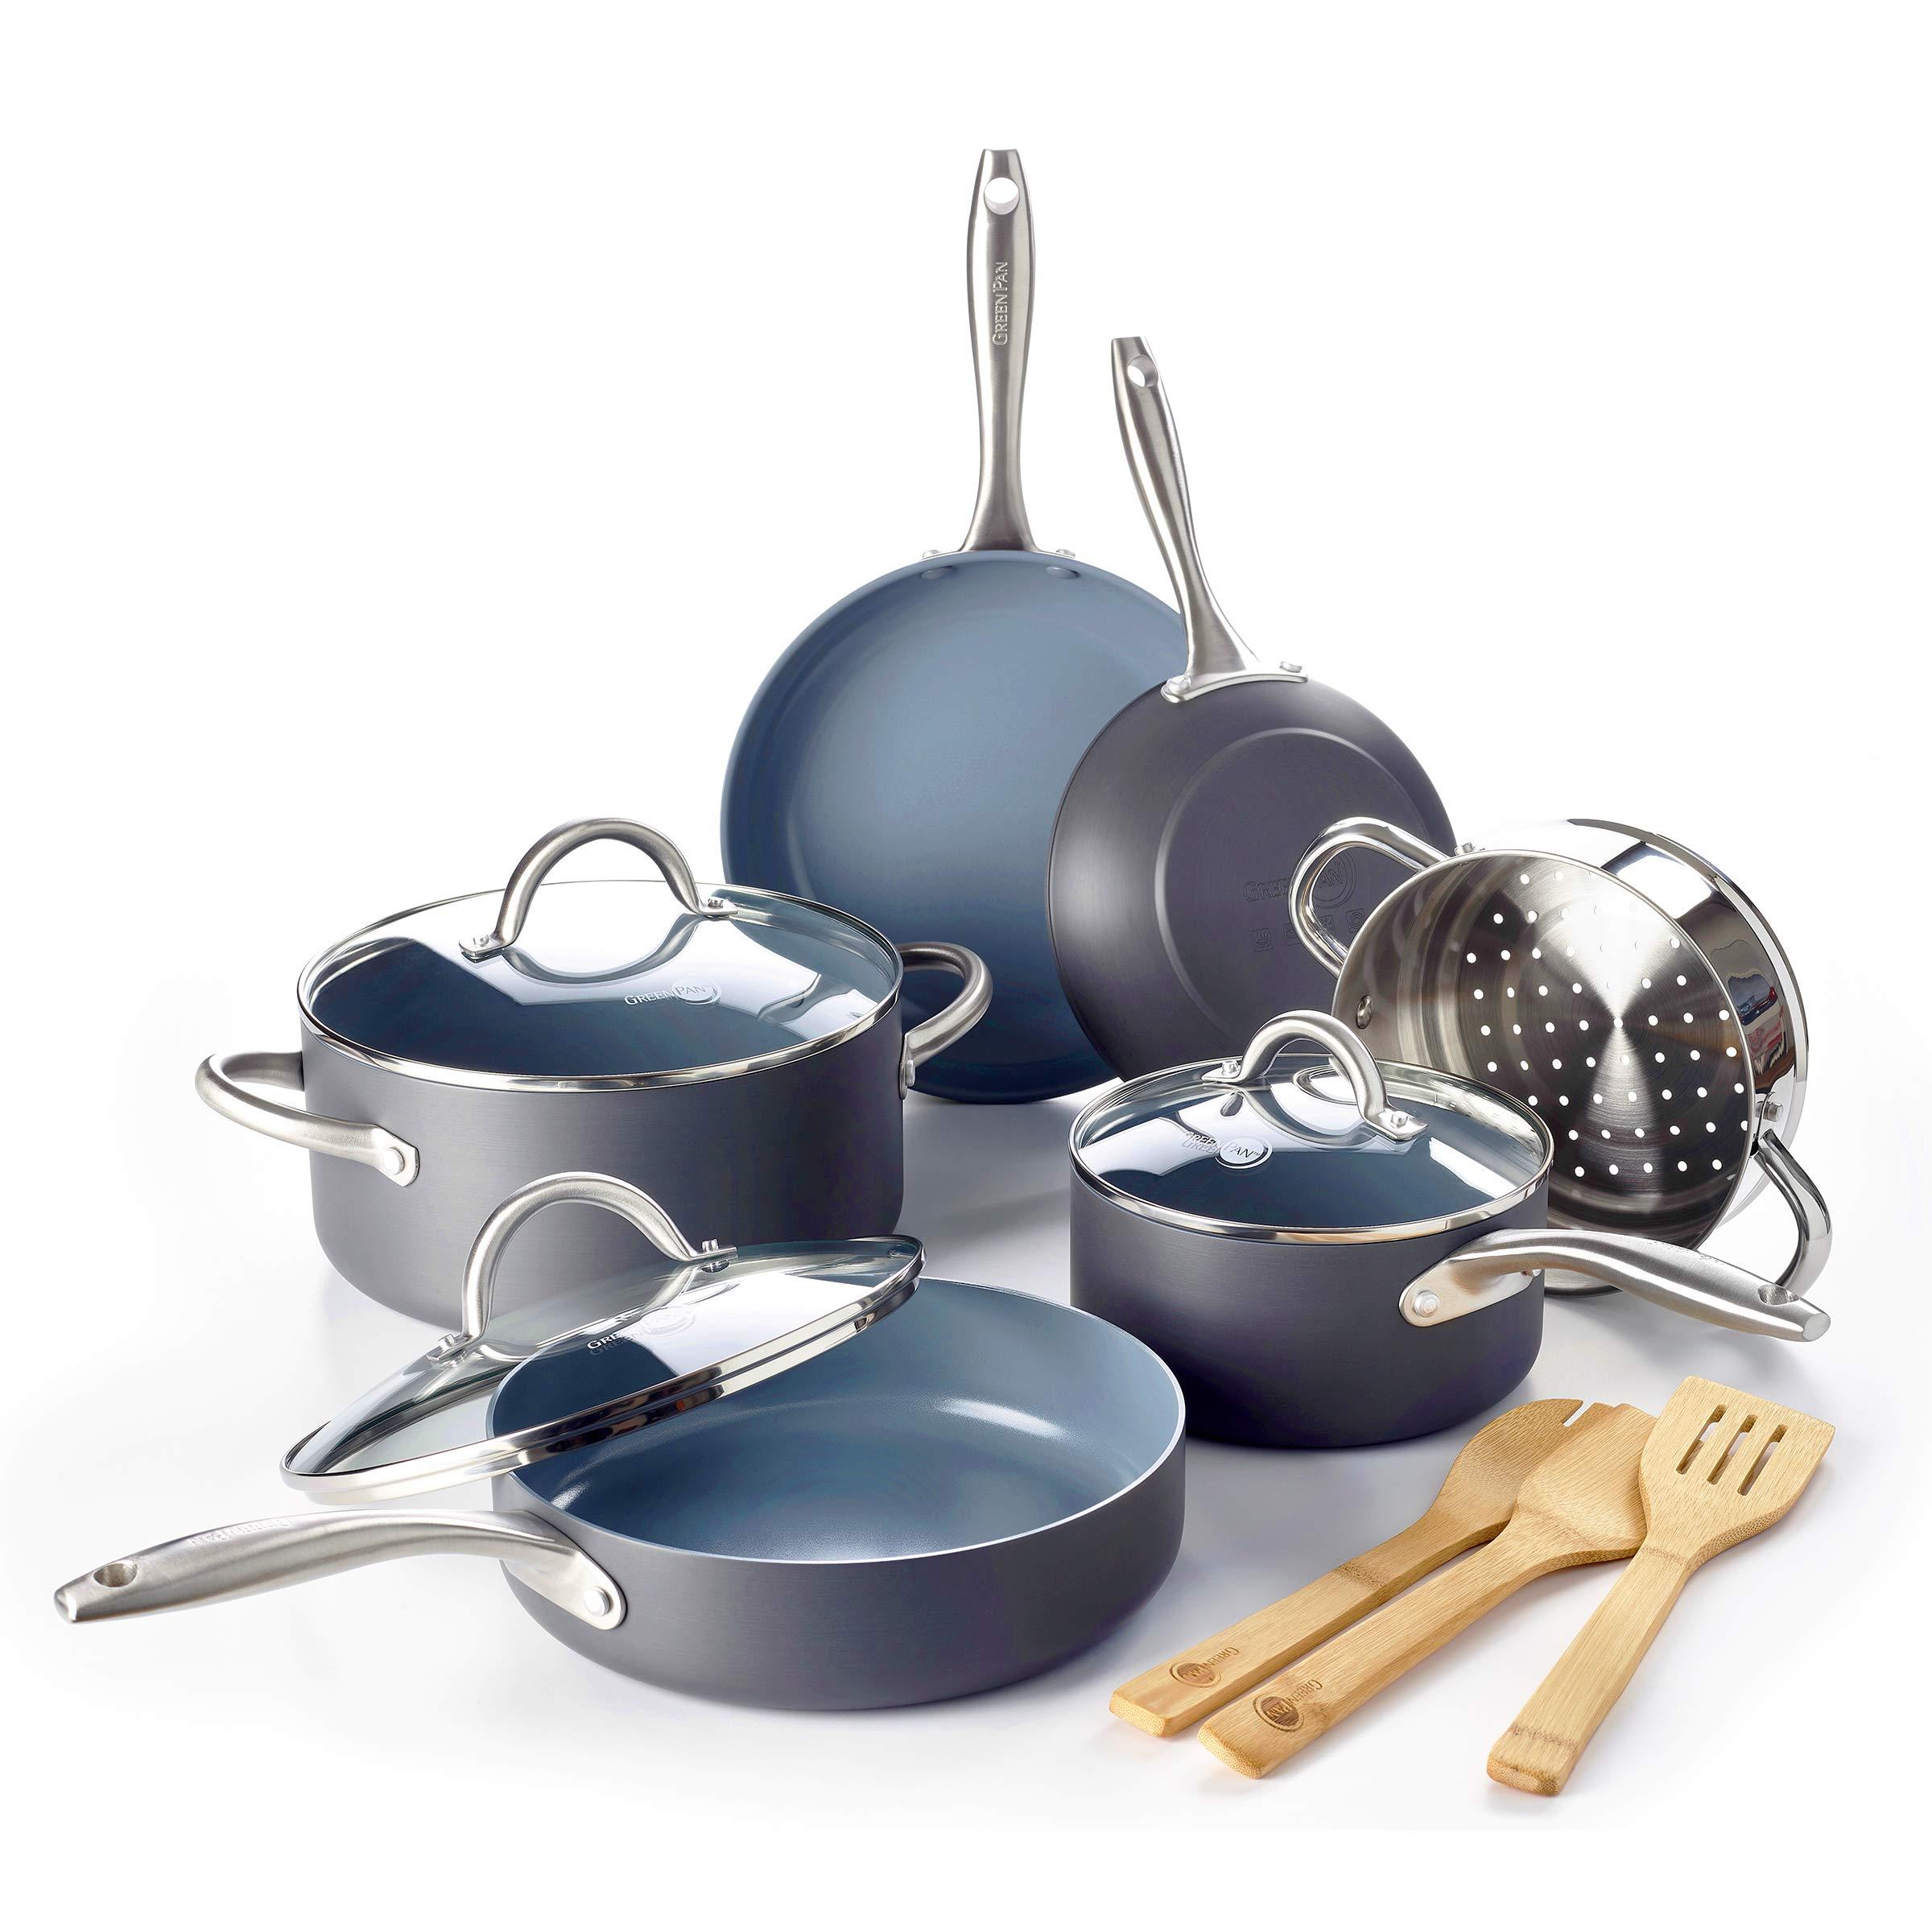 GreenPan Lima Ceramic Non-Stick Cookware Set, 12pc